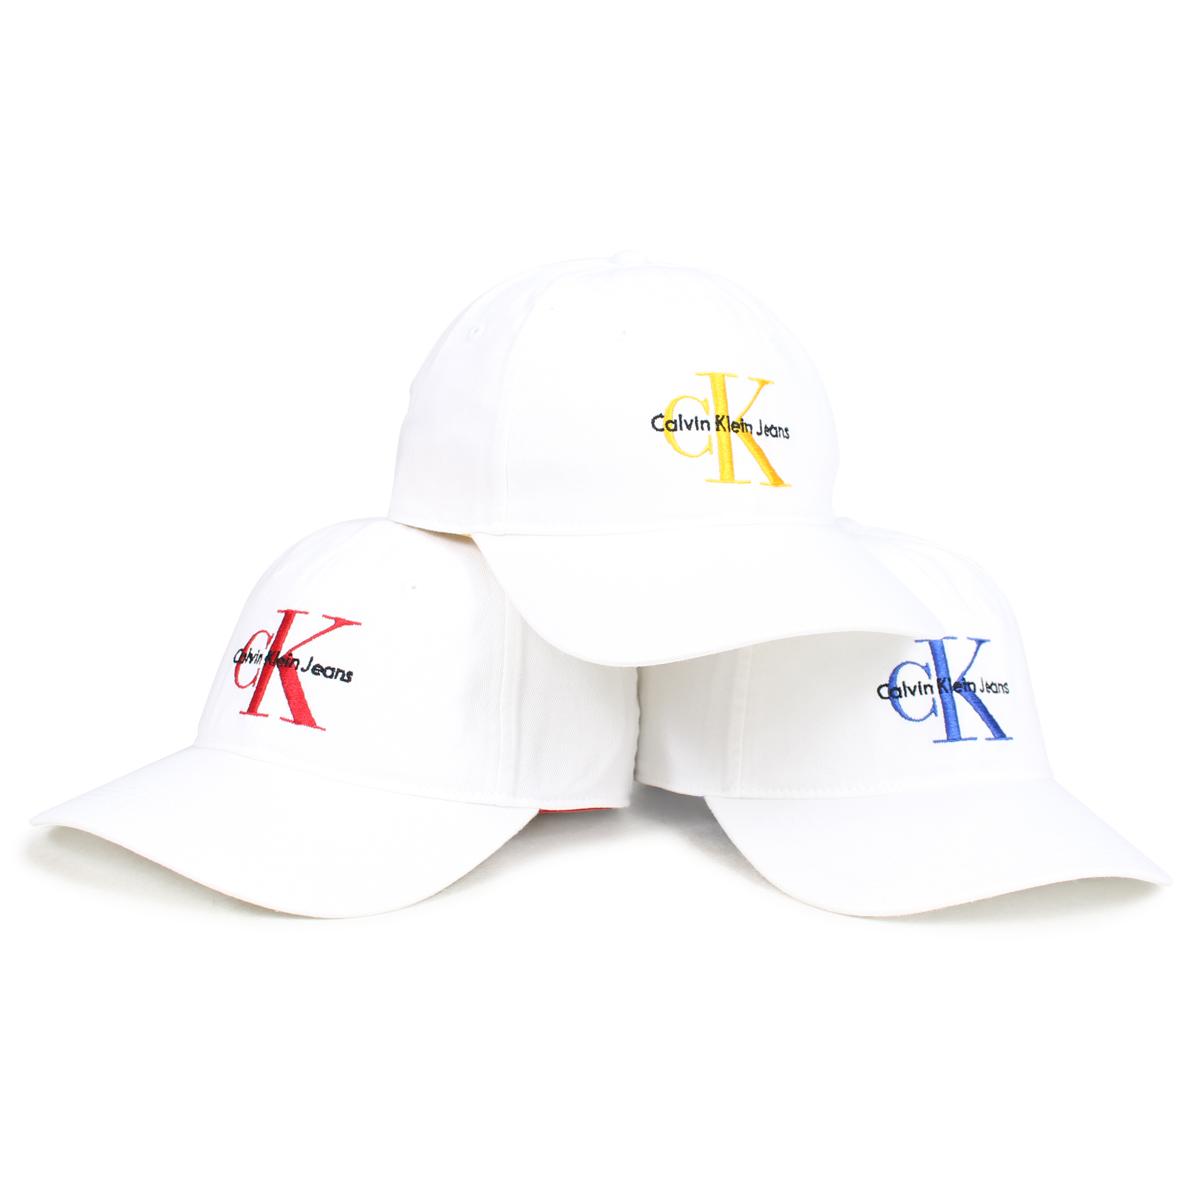 ALLSPORTS  Calvin Klein Jeans BASEBALL DAD CAP Calvin Klein jeans cap hat  men gap Dis white 41HH911  5 25 Shinnyu load   185   0e95f9844a5